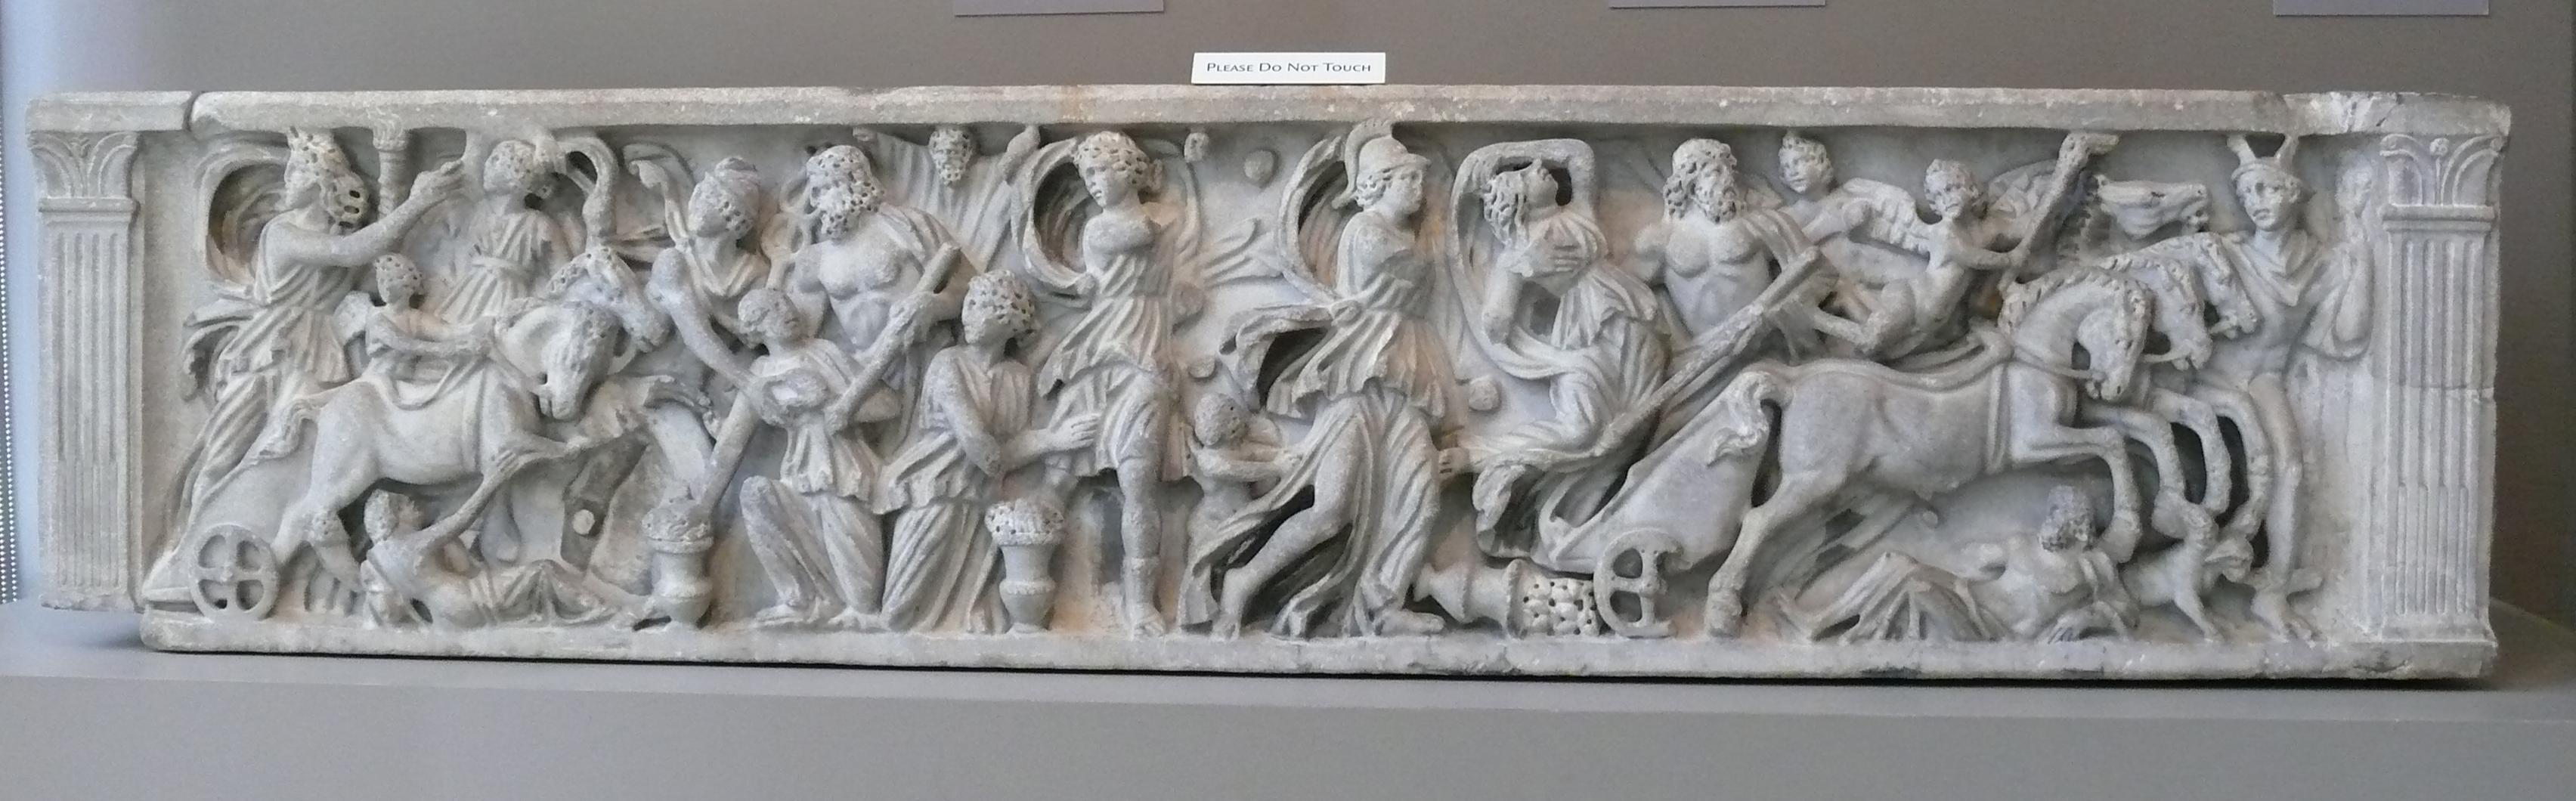 Sarcófago que mostra o roubo de Perséfone por Hades. 200b367fc17